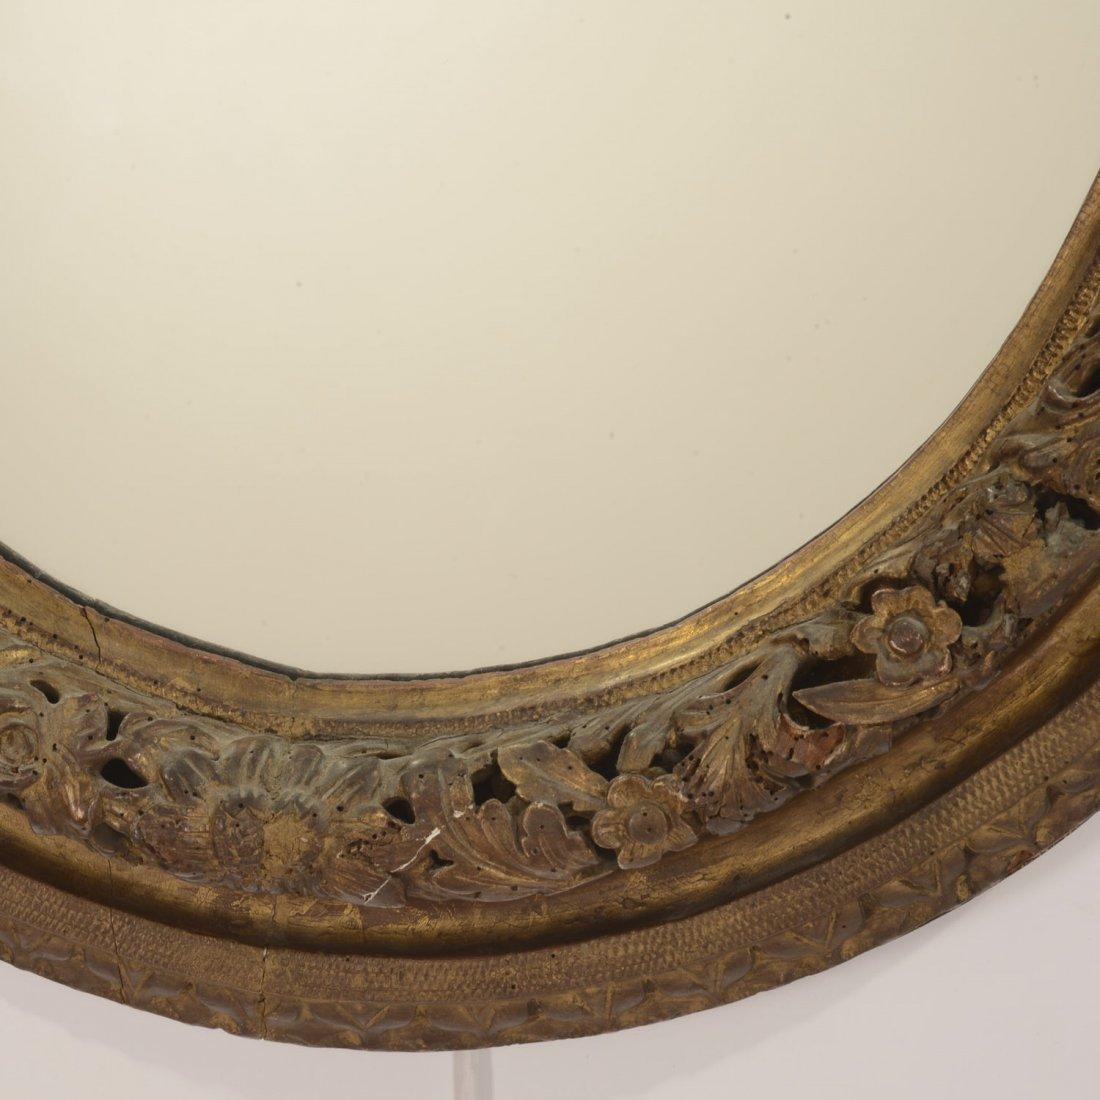 Continental Rococo giltwood oval wall mirror - 3